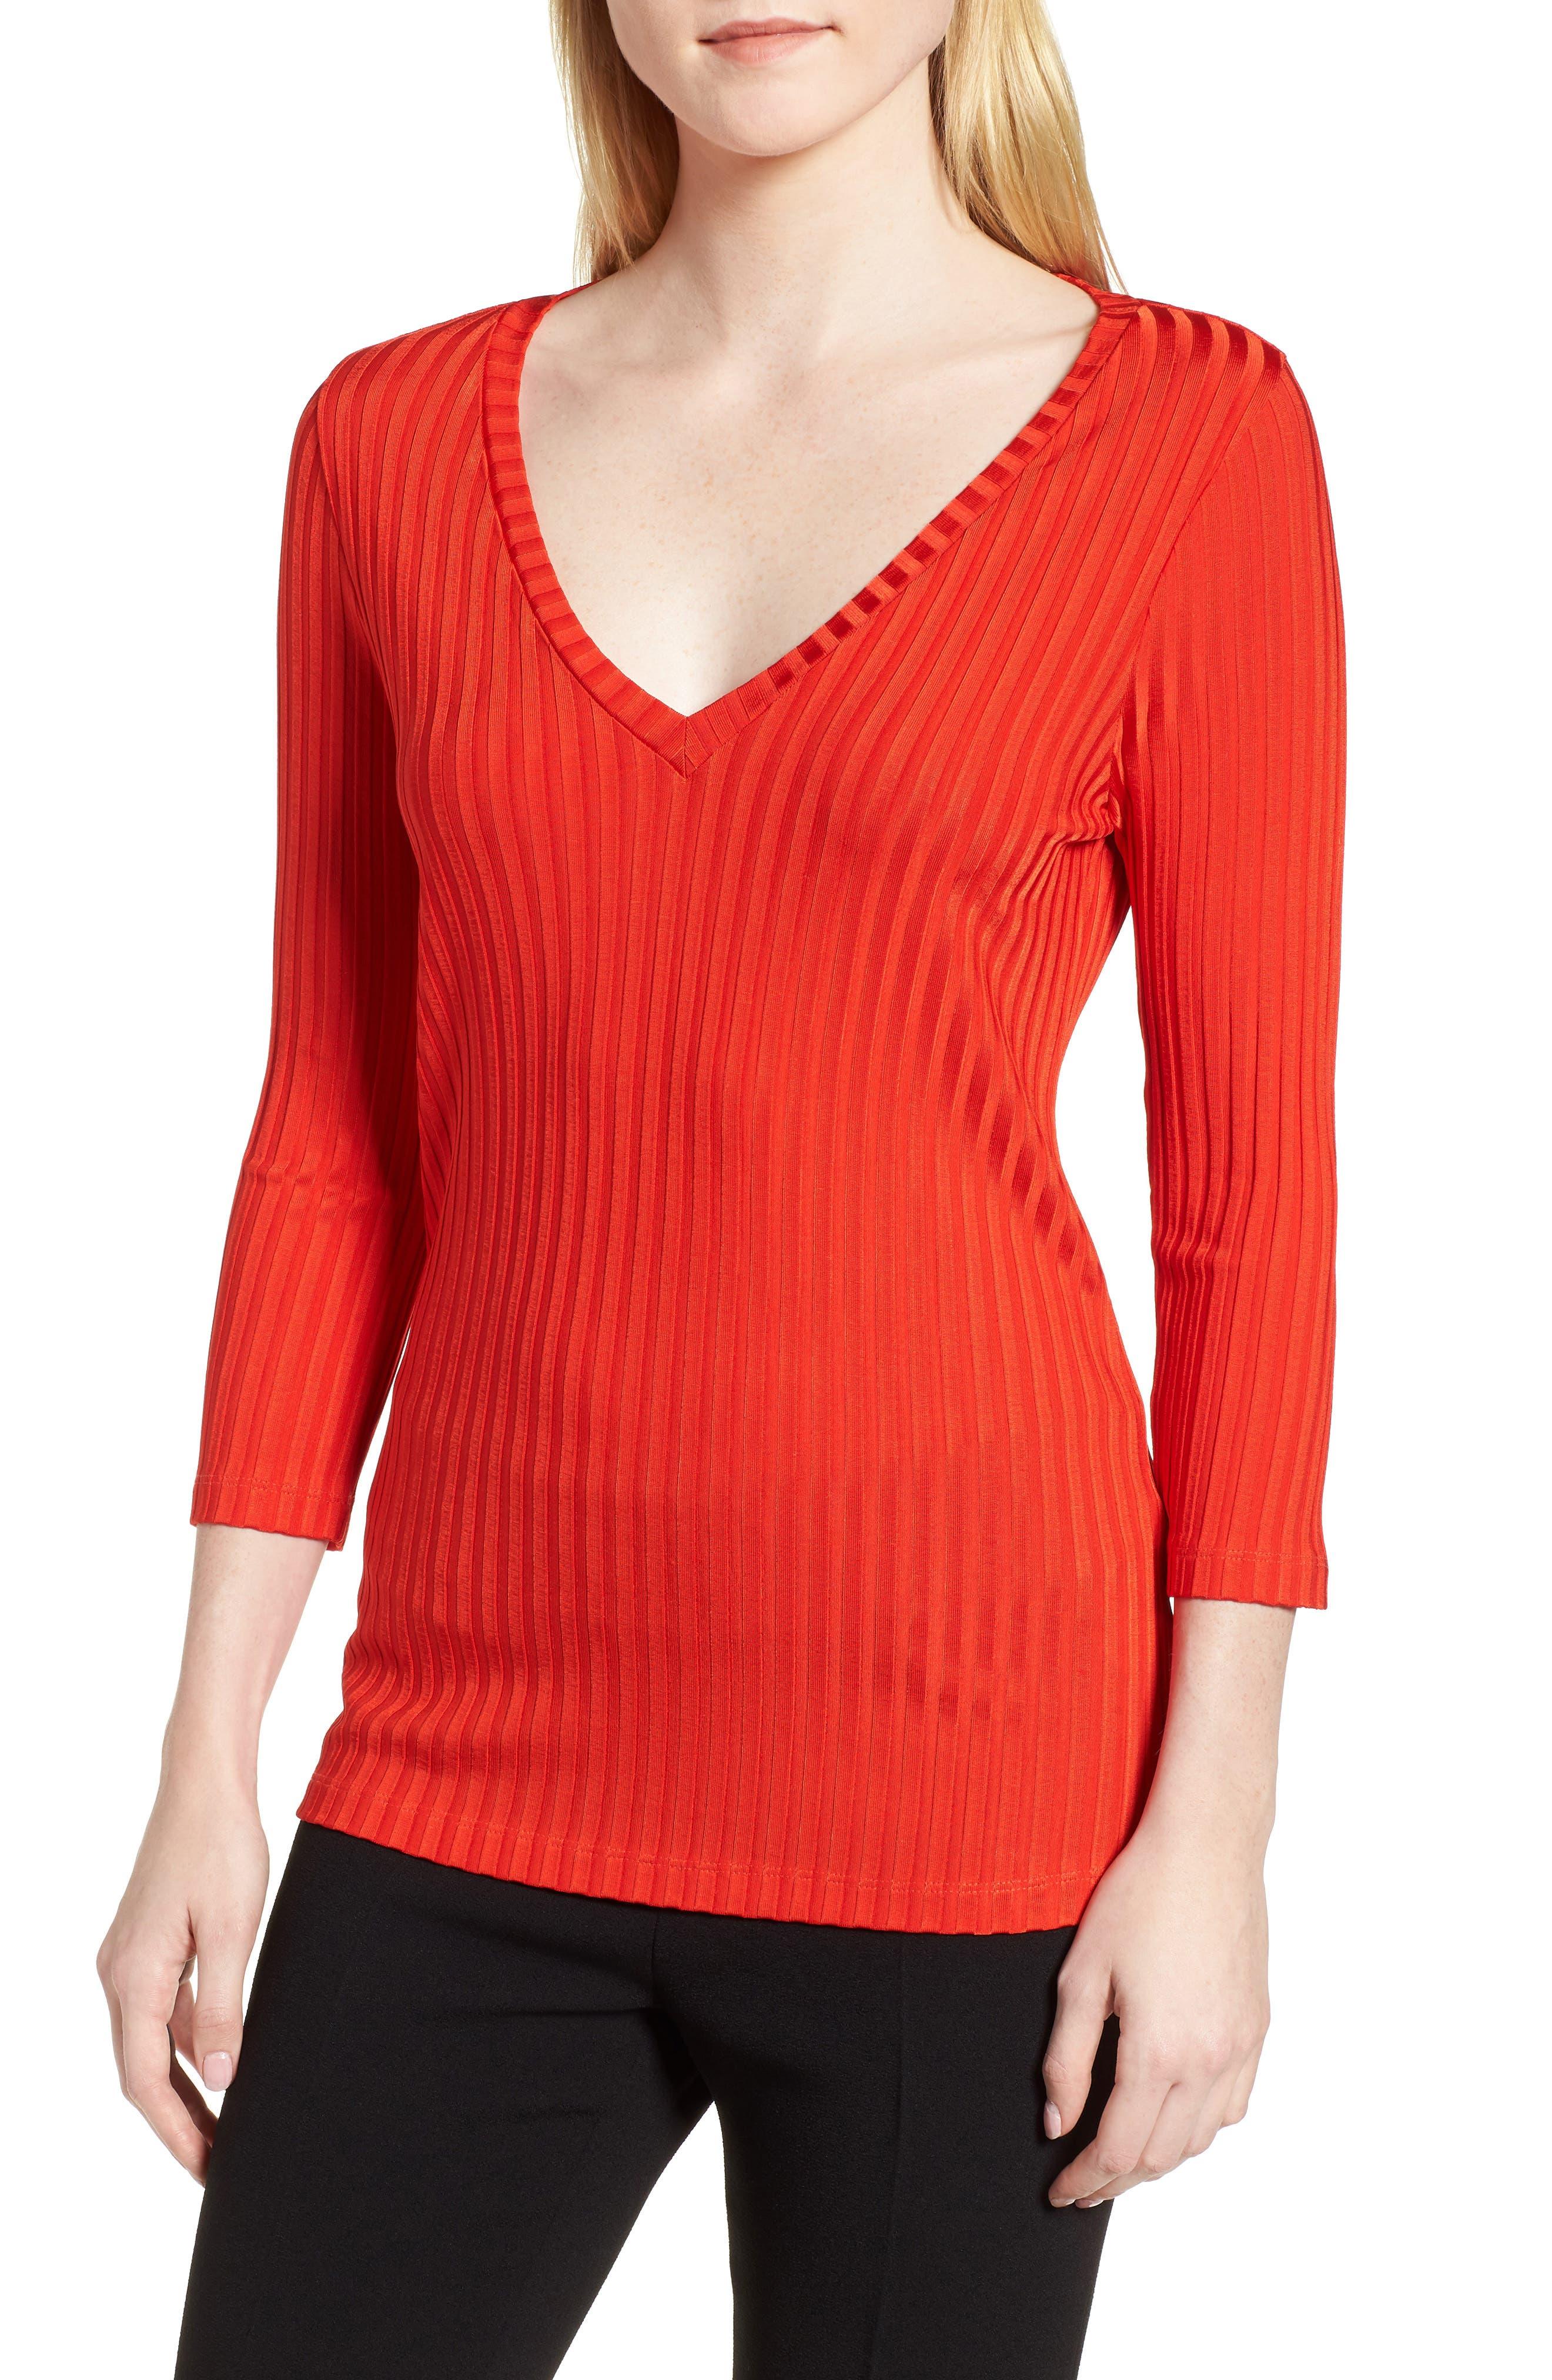 Etrica V-Neck Ribbed Top,                         Main,                         color, Sunset Orange